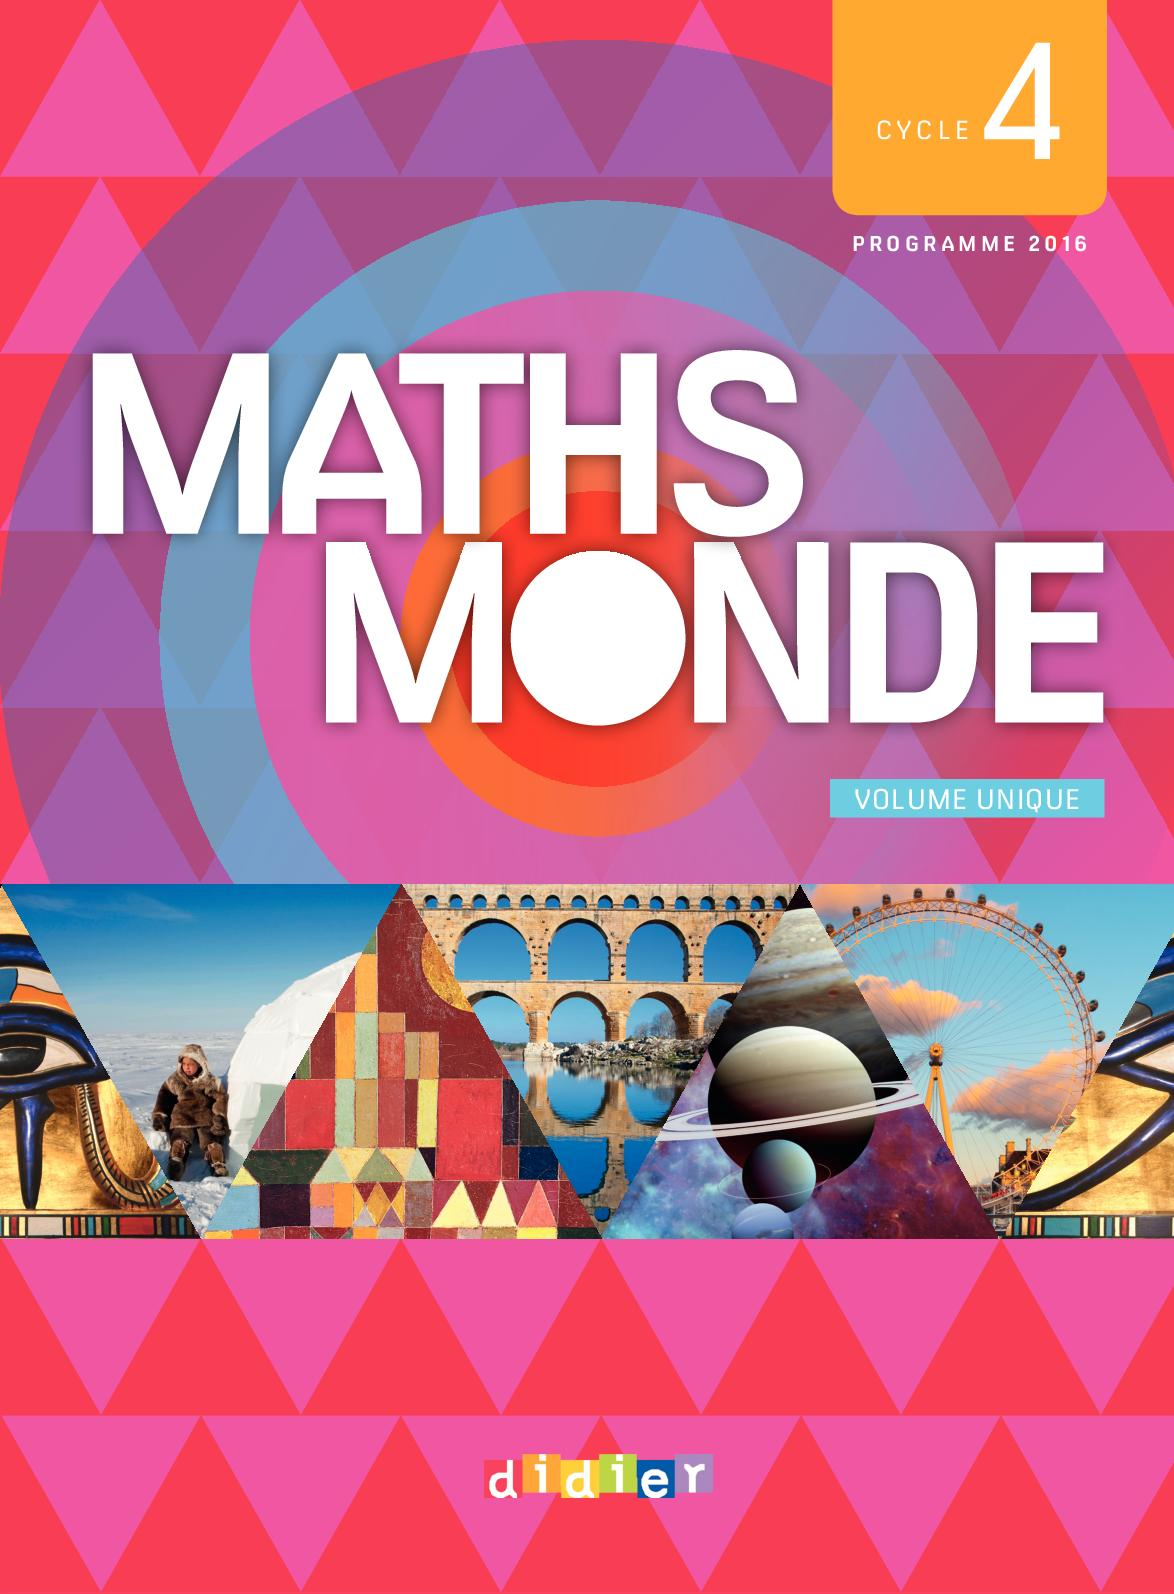 Calaméo - Maths Monde Cycle 4 - Extrait